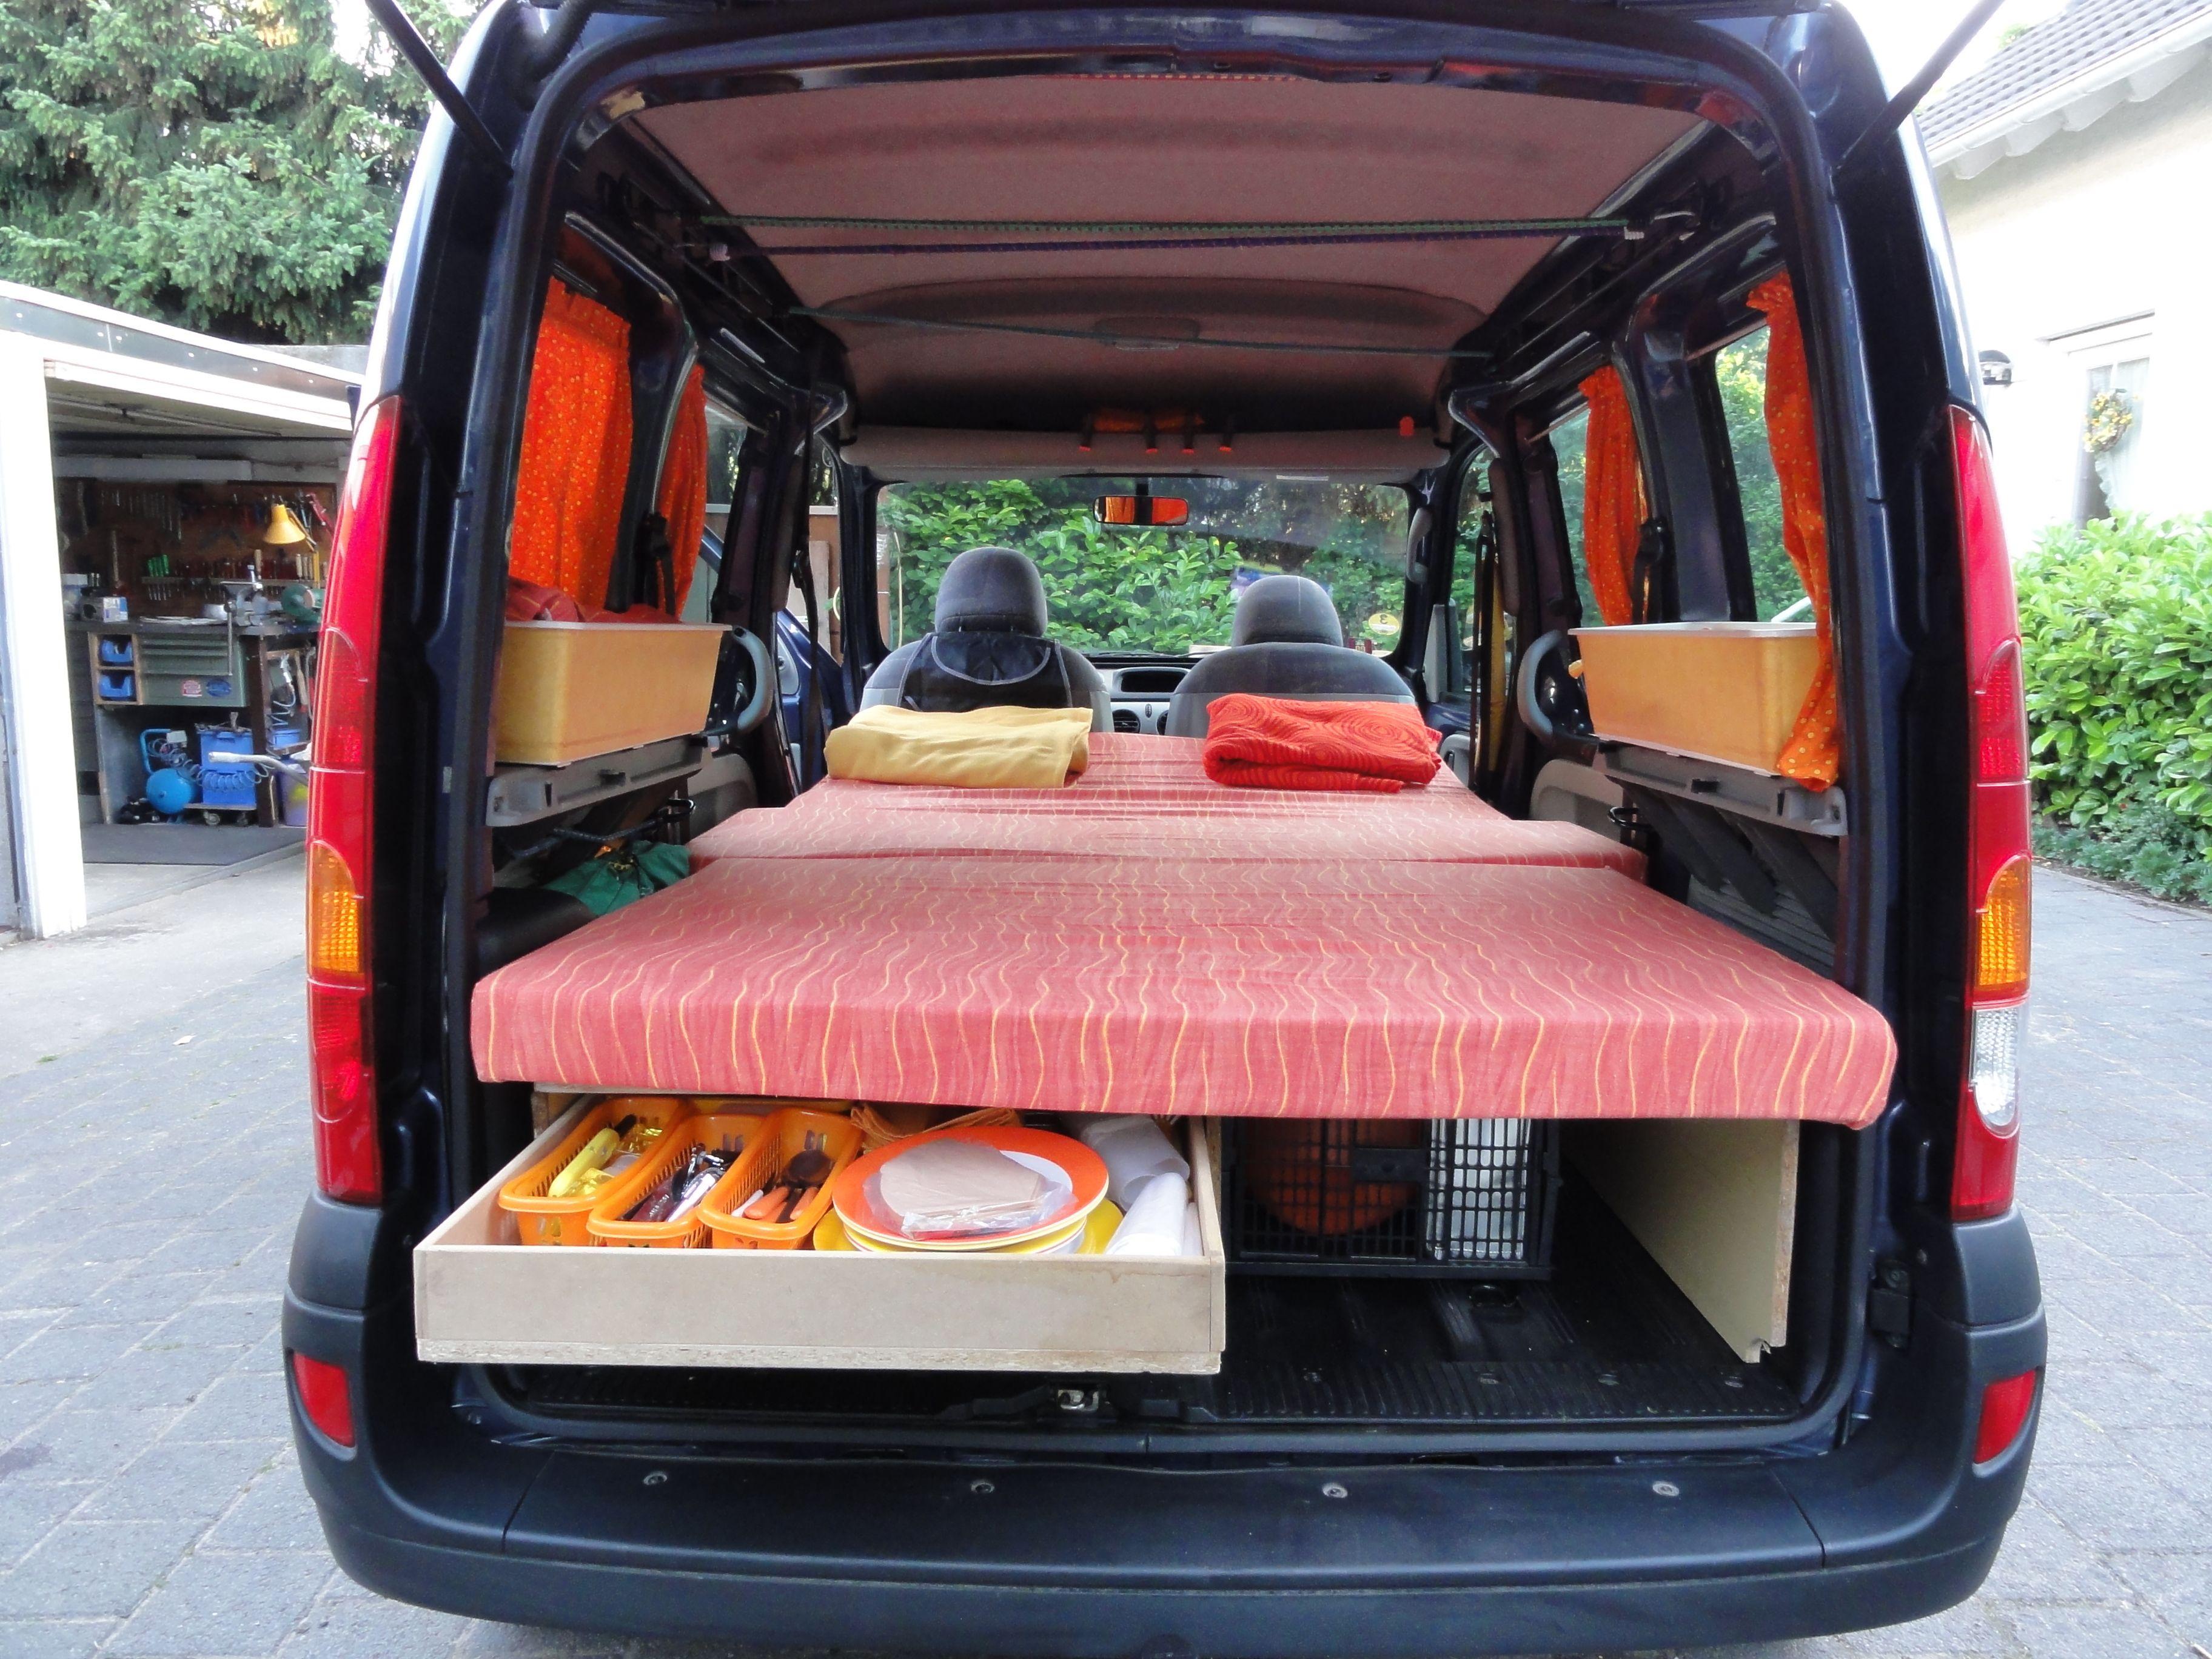 renault kangoo interior vans pinterest projekte and. Black Bedroom Furniture Sets. Home Design Ideas